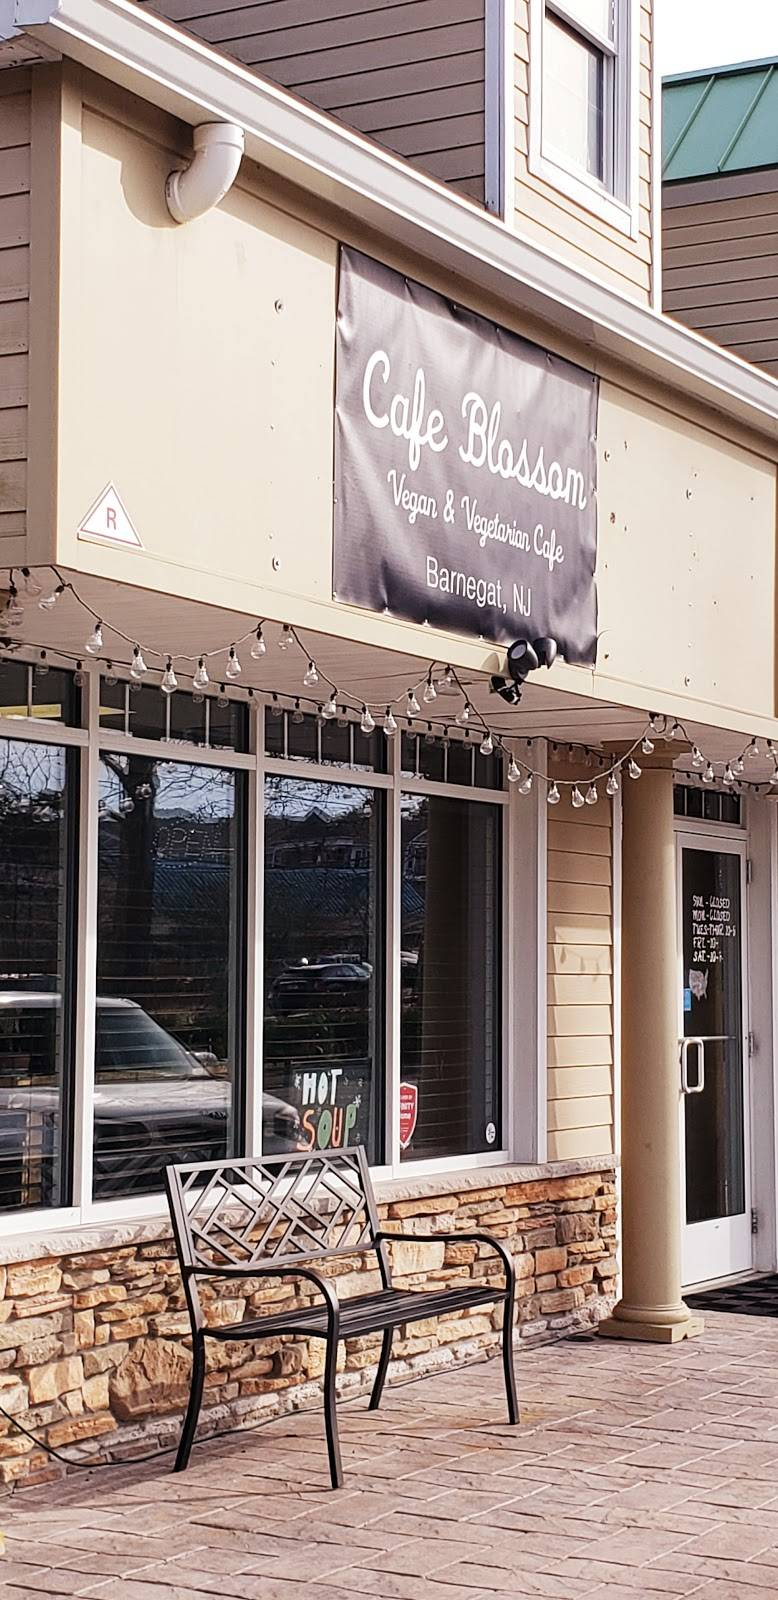 Cafe Blossom   cafe   34 S Main St, Barnegat, NJ 08005, USA   6093392727 OR +1 609-339-2727